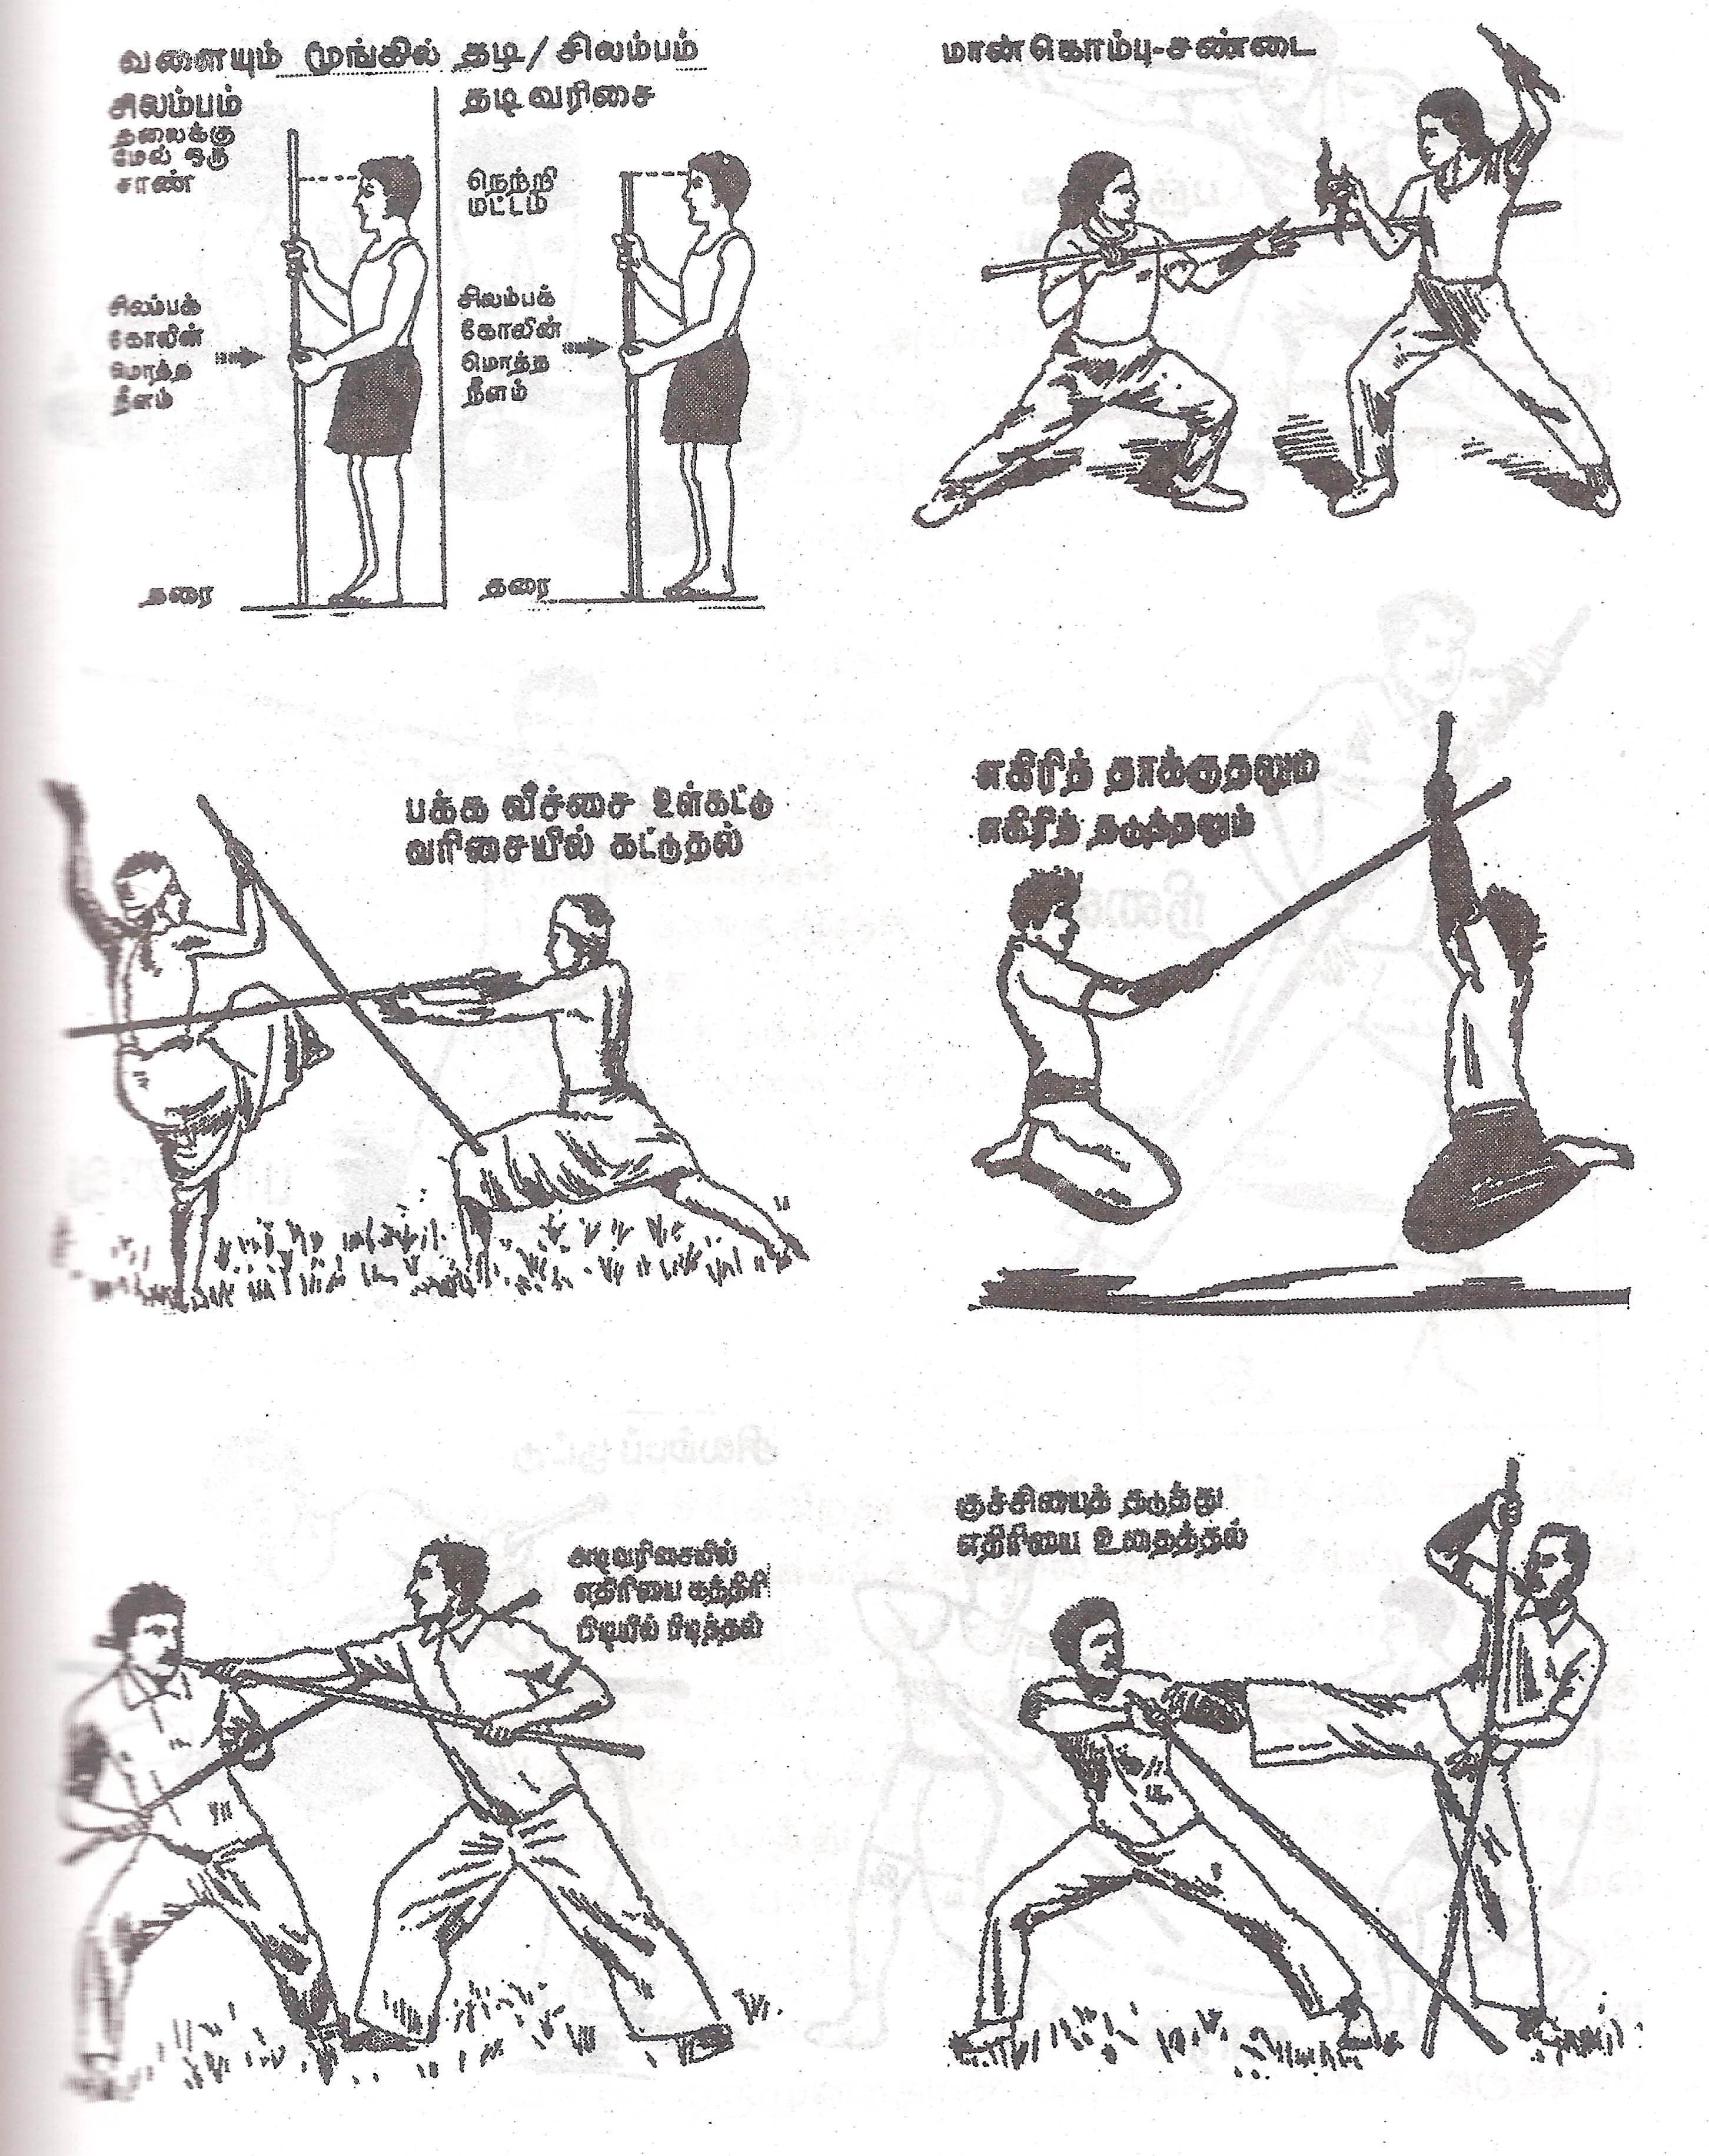 Las Vegas Martial Arts For Kids Eskrima Stick Fighting Classes Youtube Learn Krav Maga Martial Arts Krav Maga